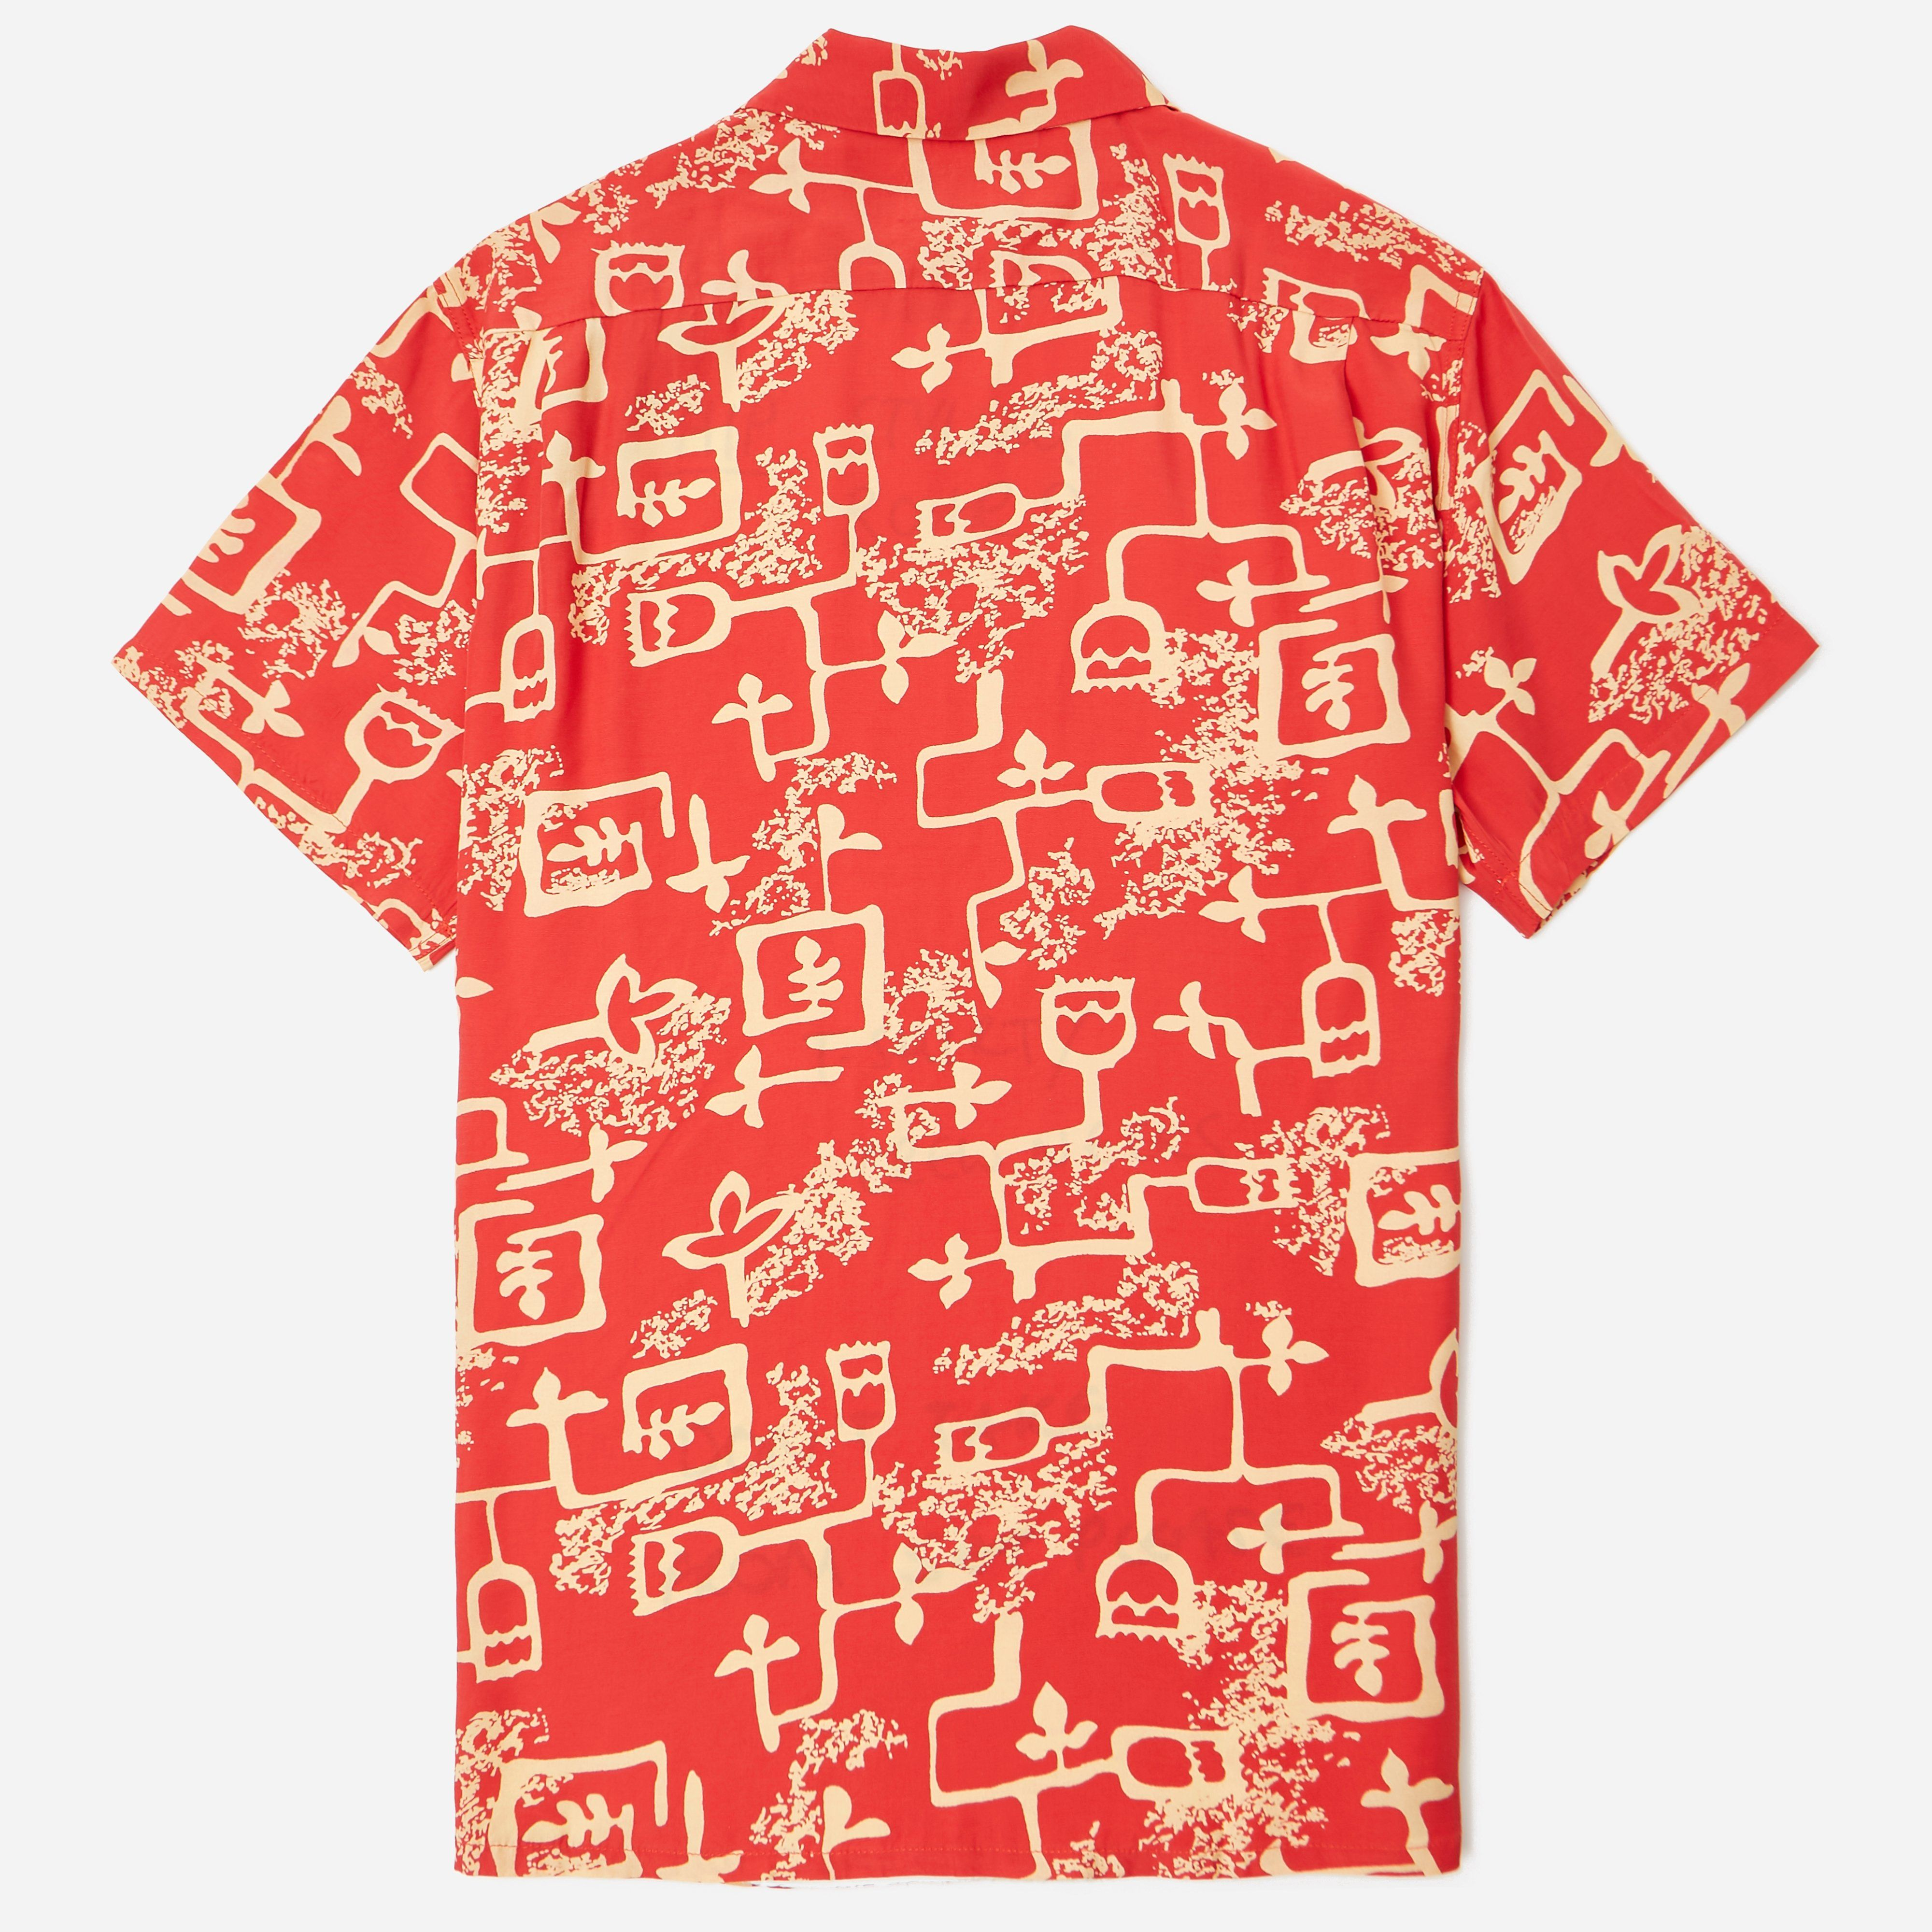 Levi's Vintage Clothing 1940s Hawaiian Shirt